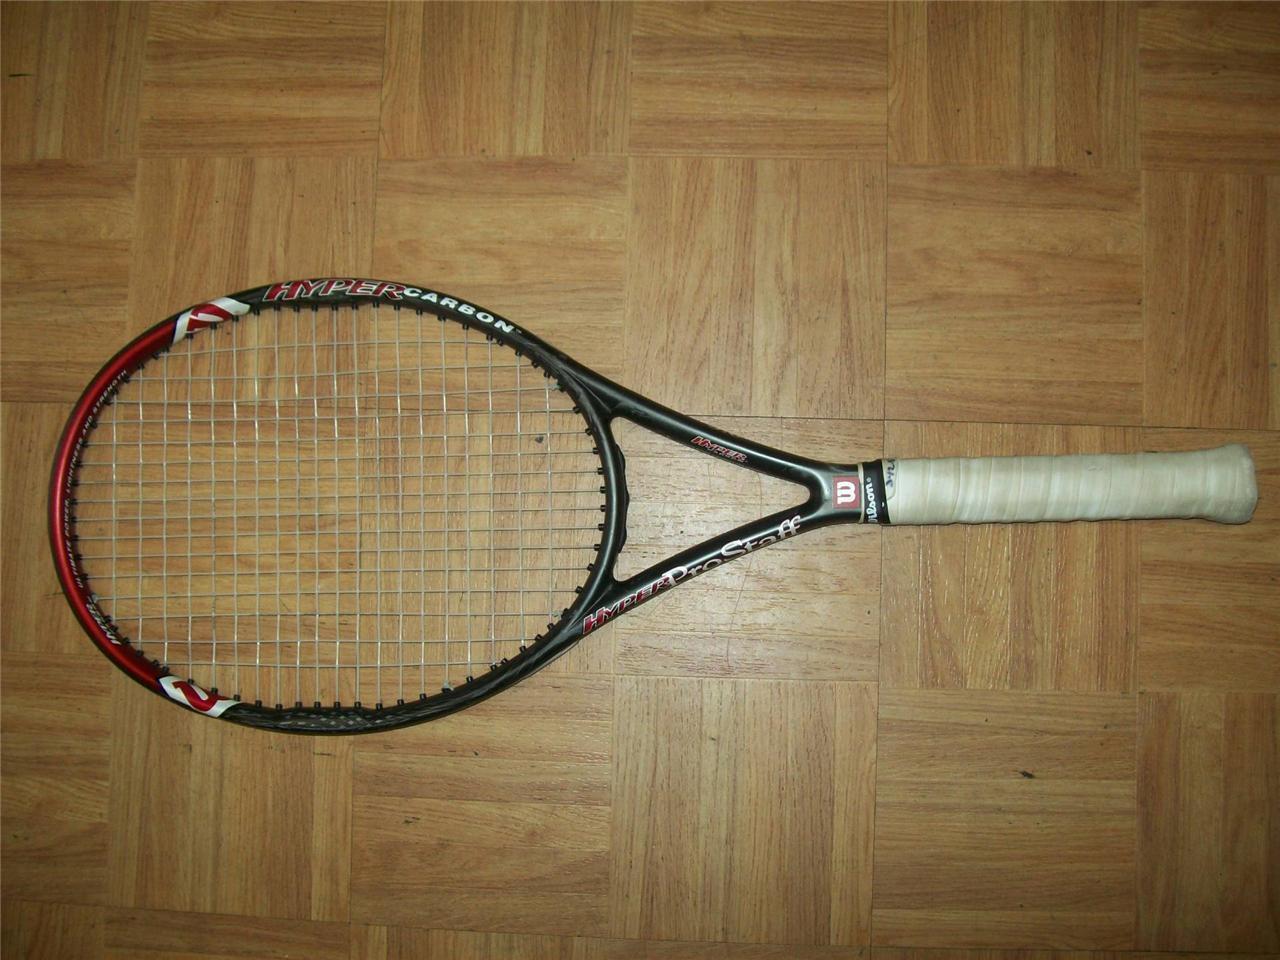 Wilson Hyper Pro Staff 5.0 STRETCH 95 Midplus 4 1/2 grip Tennis Racquet